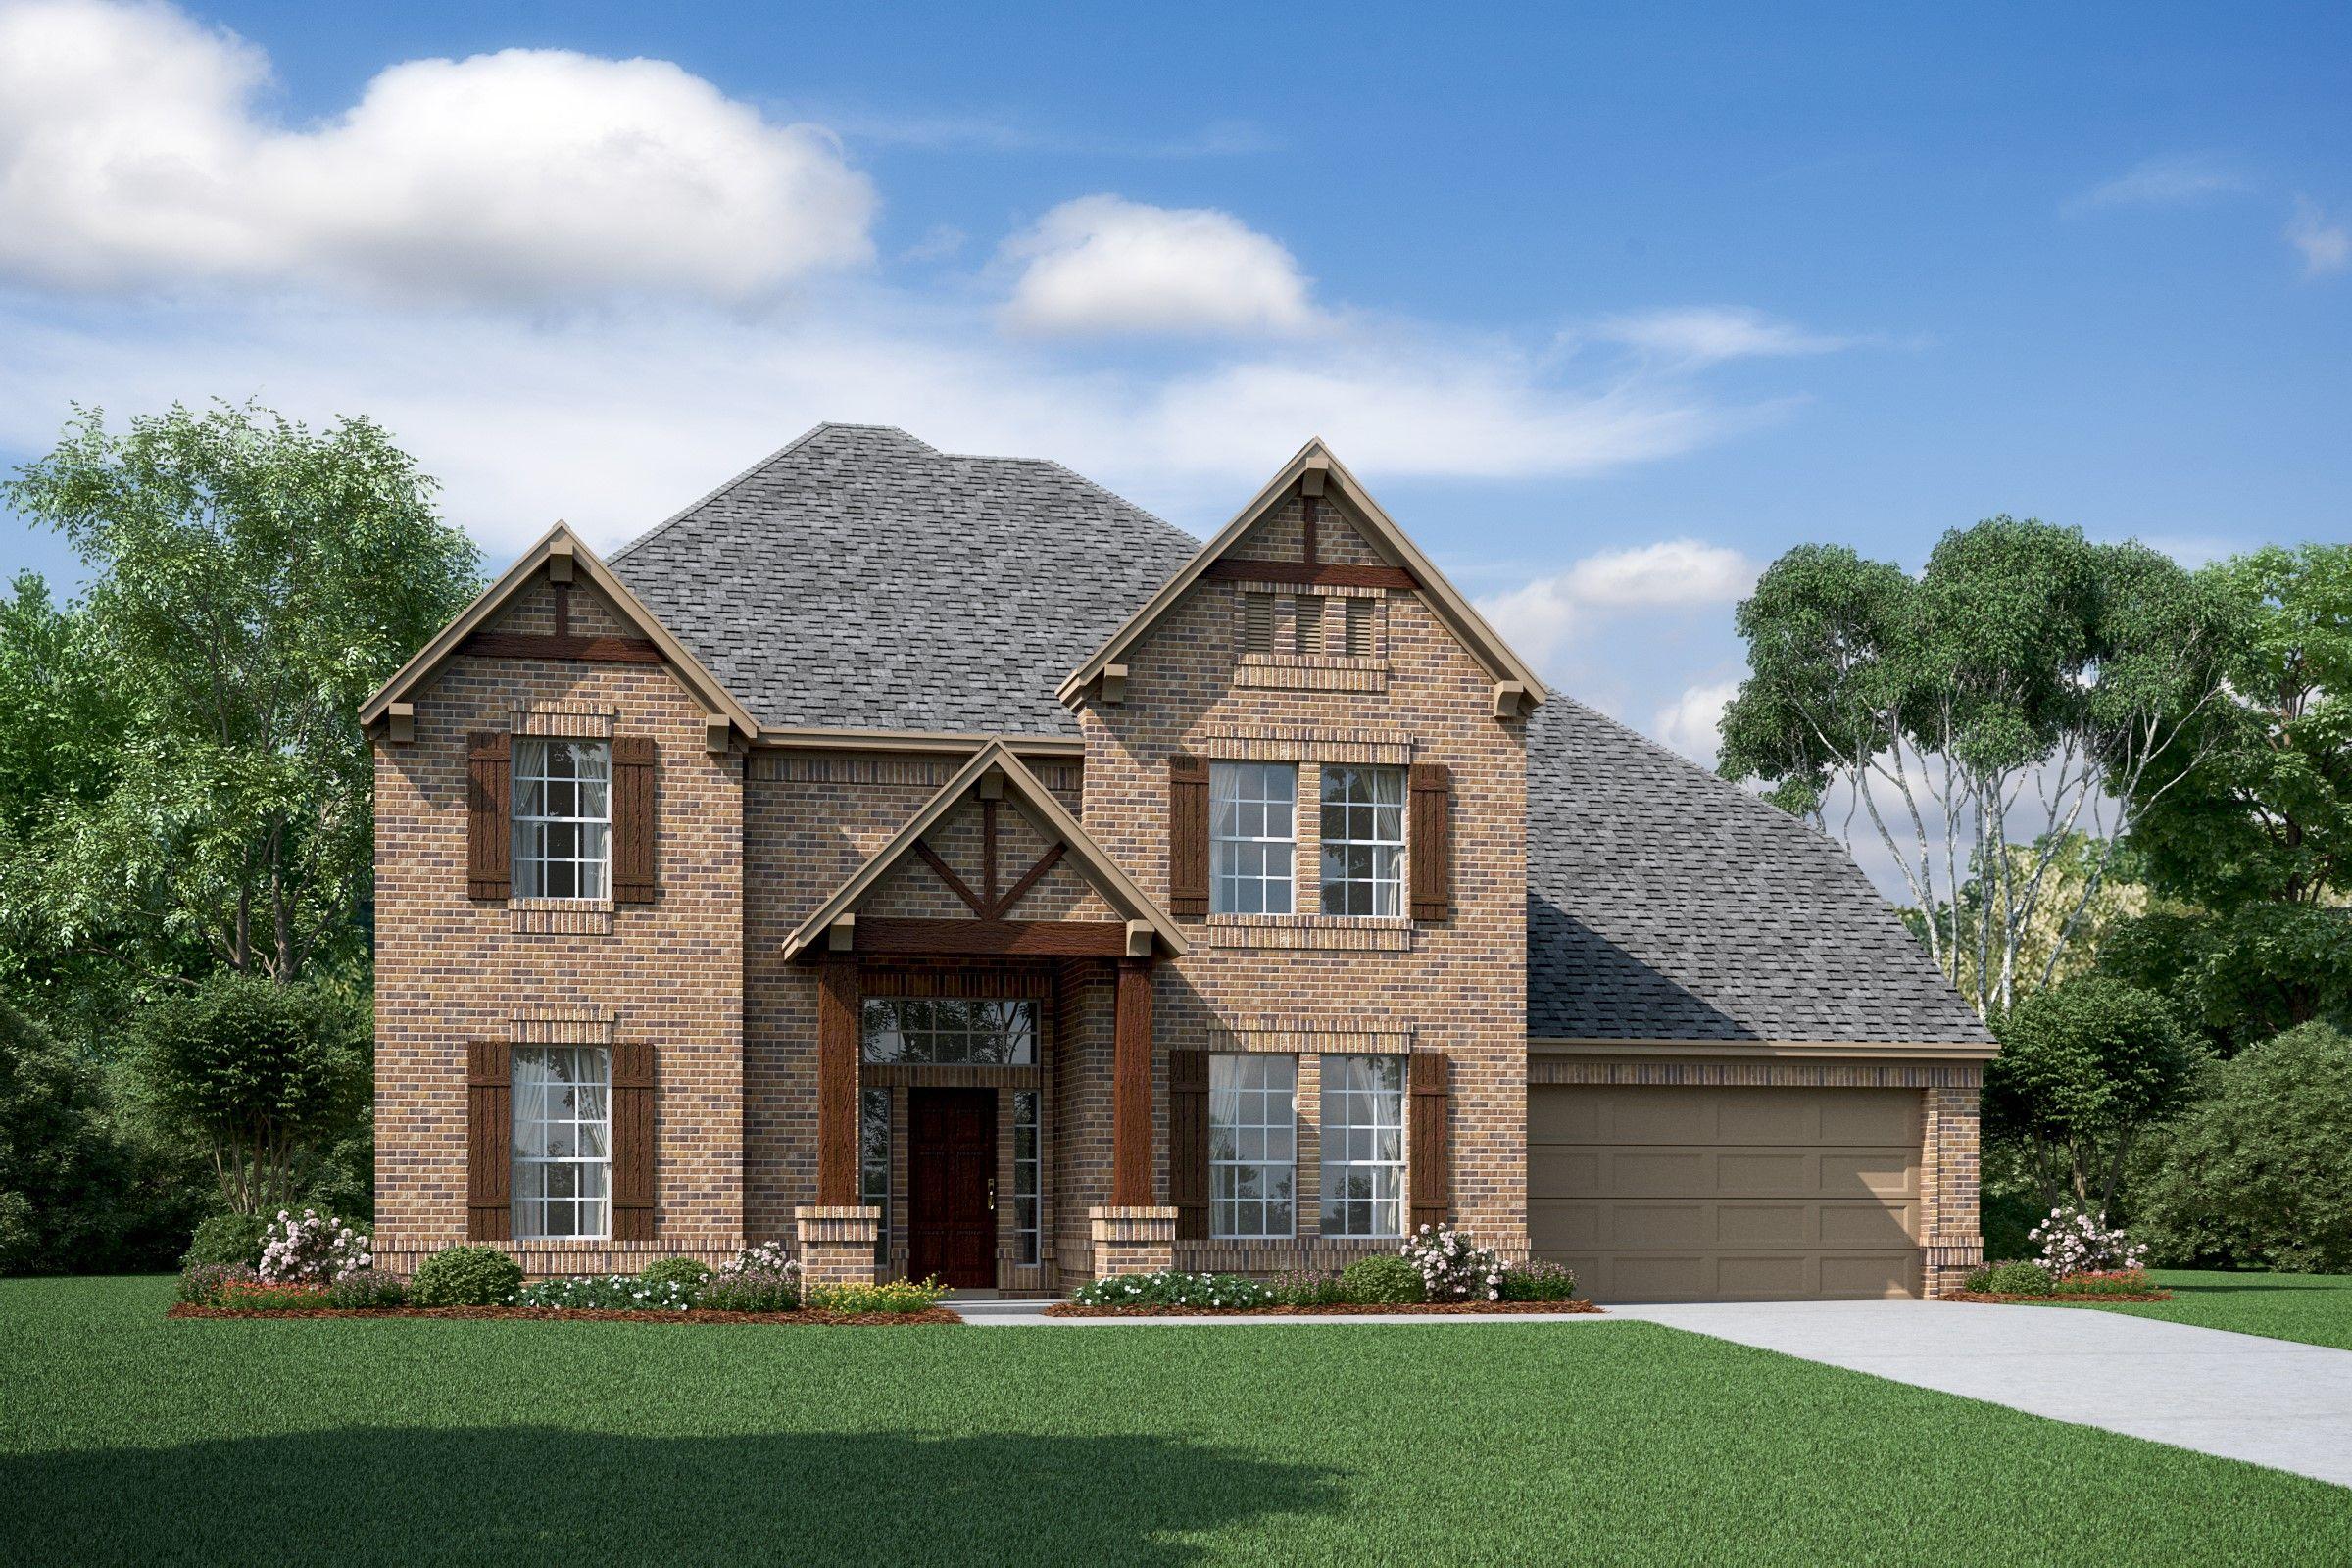 Single Family for Sale at Jonathan 14811 Starwood Drive, Homesite 9 Baytown, Texas 77523 United States